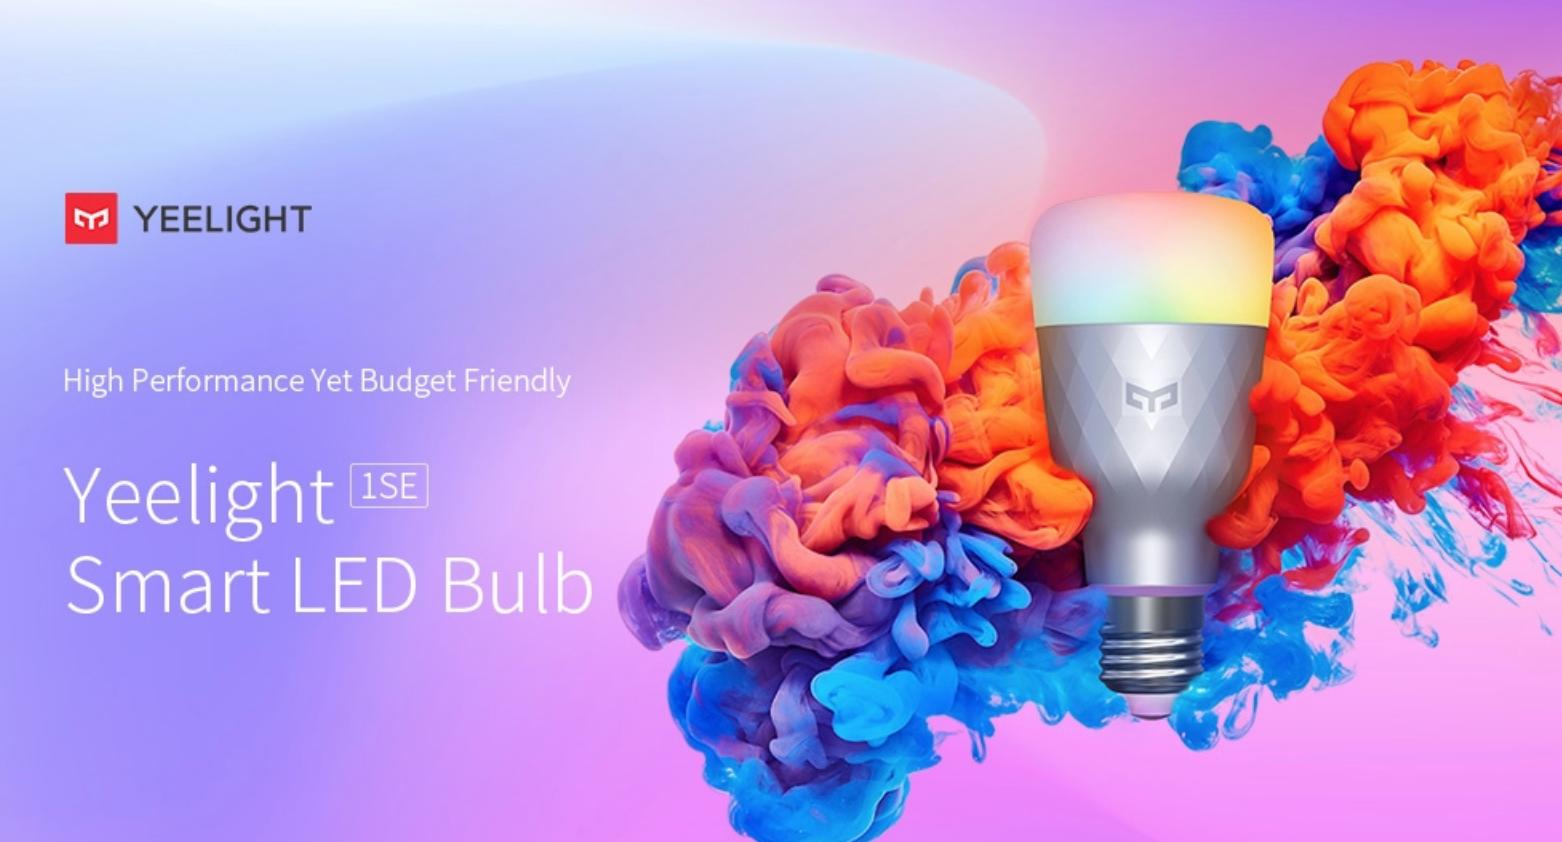 لامپ هوشمند LED Yeelight 1SE